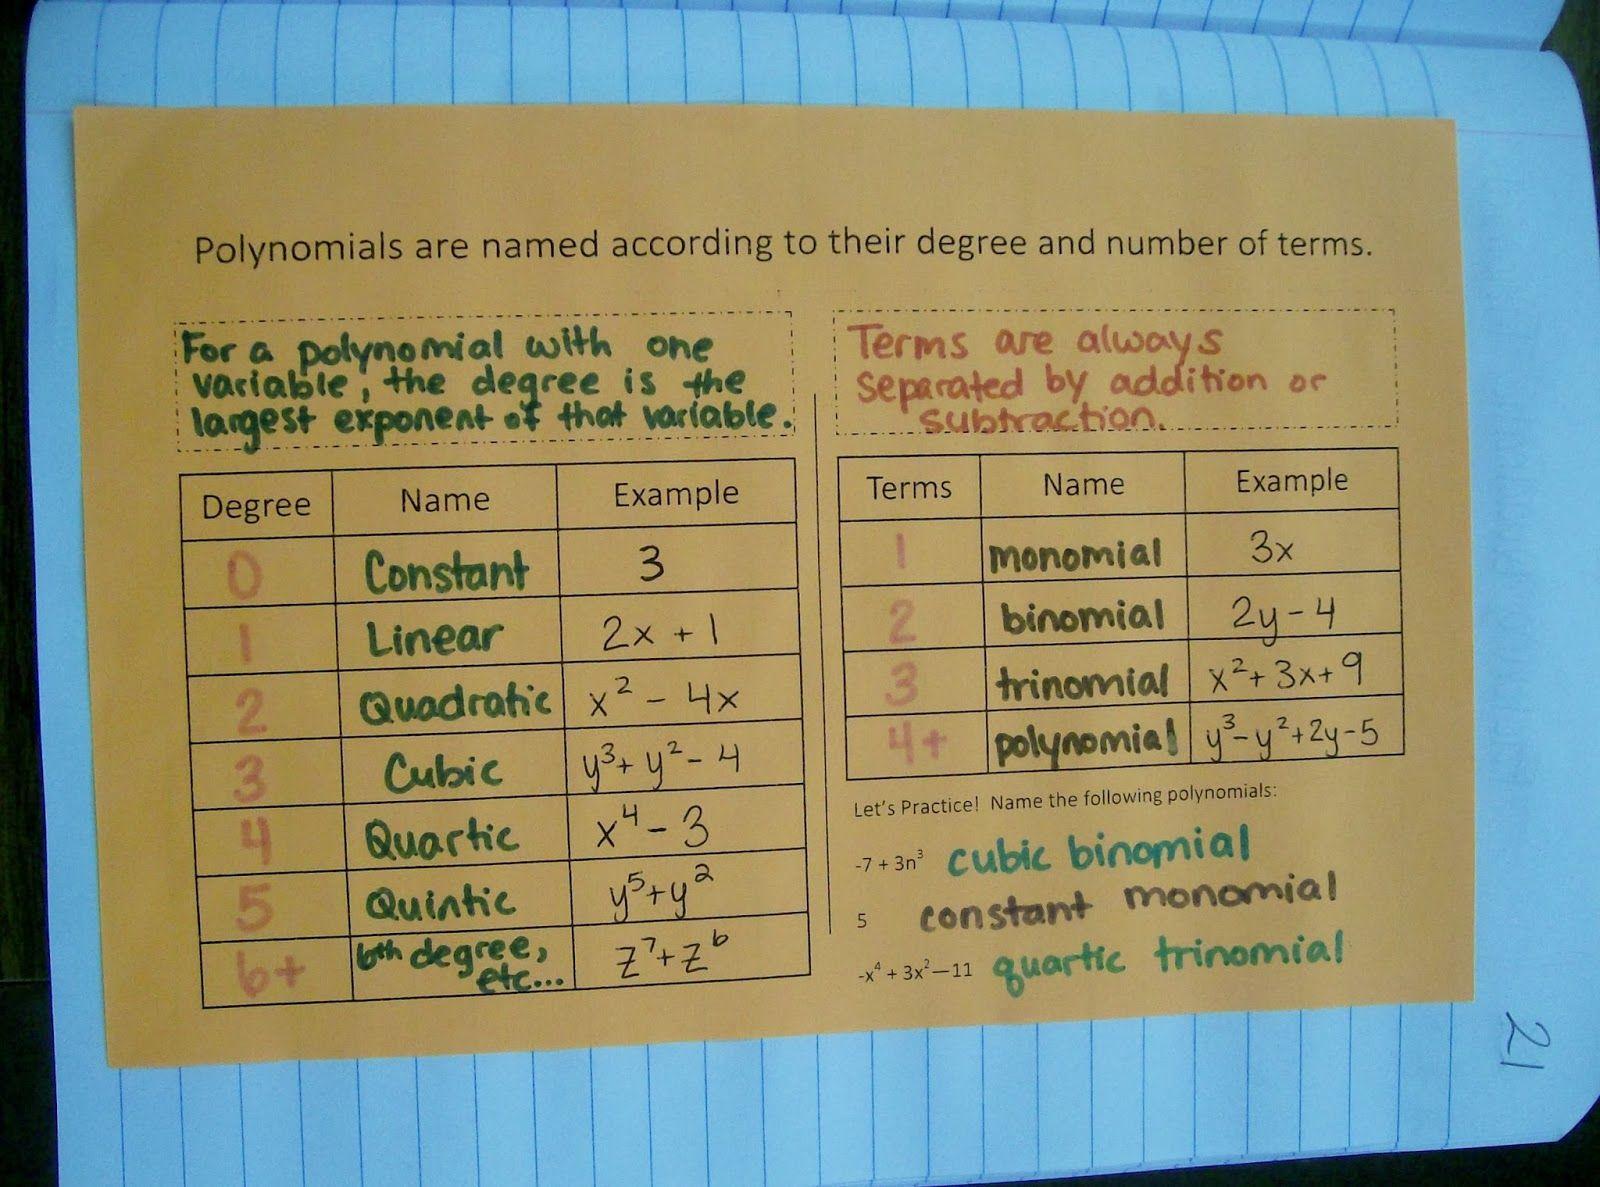 Worksheets Naming Polynomials Worksheet classifying polynomials chart 103 3374 jpg extending jpg